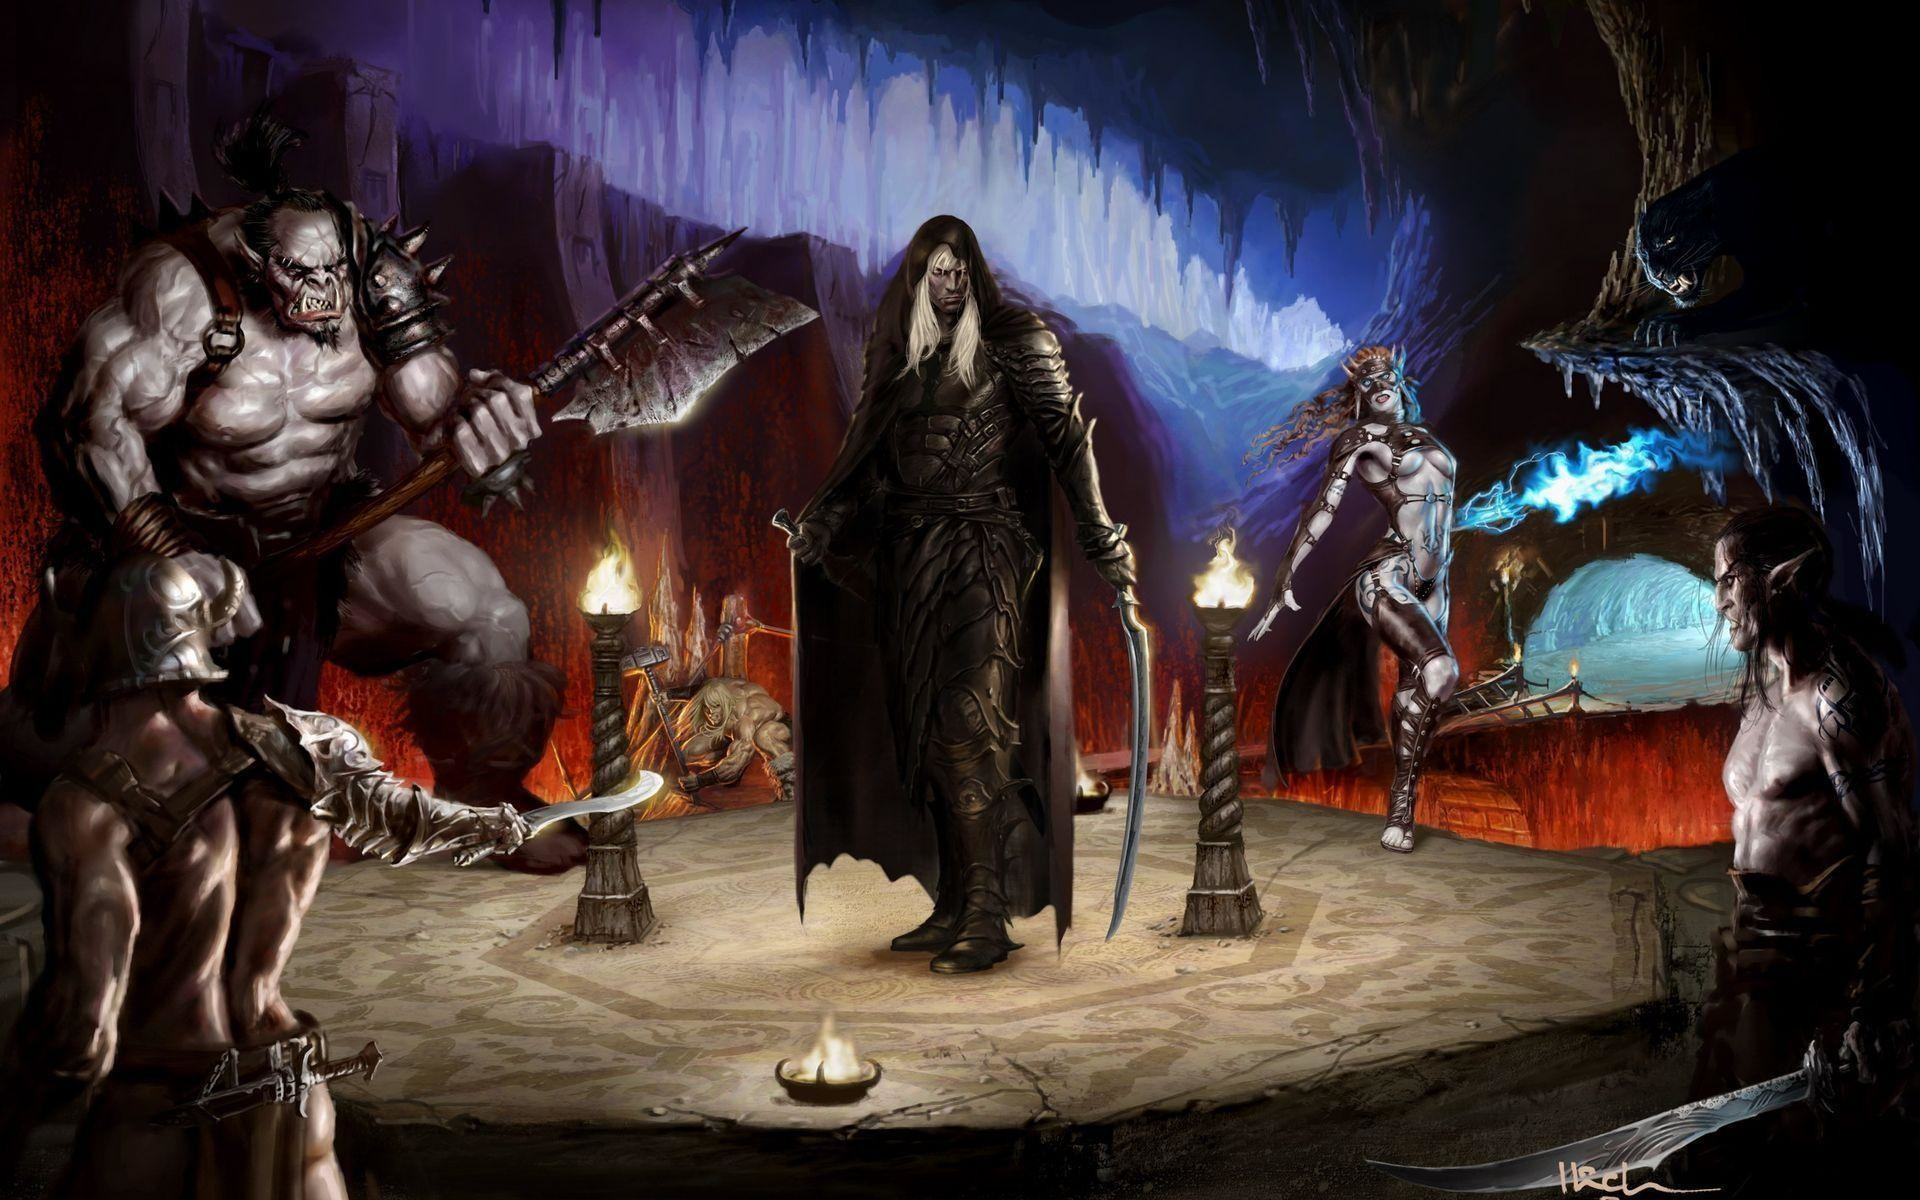 Fantasy Forgotten Realms Wallpaper px Free Download .